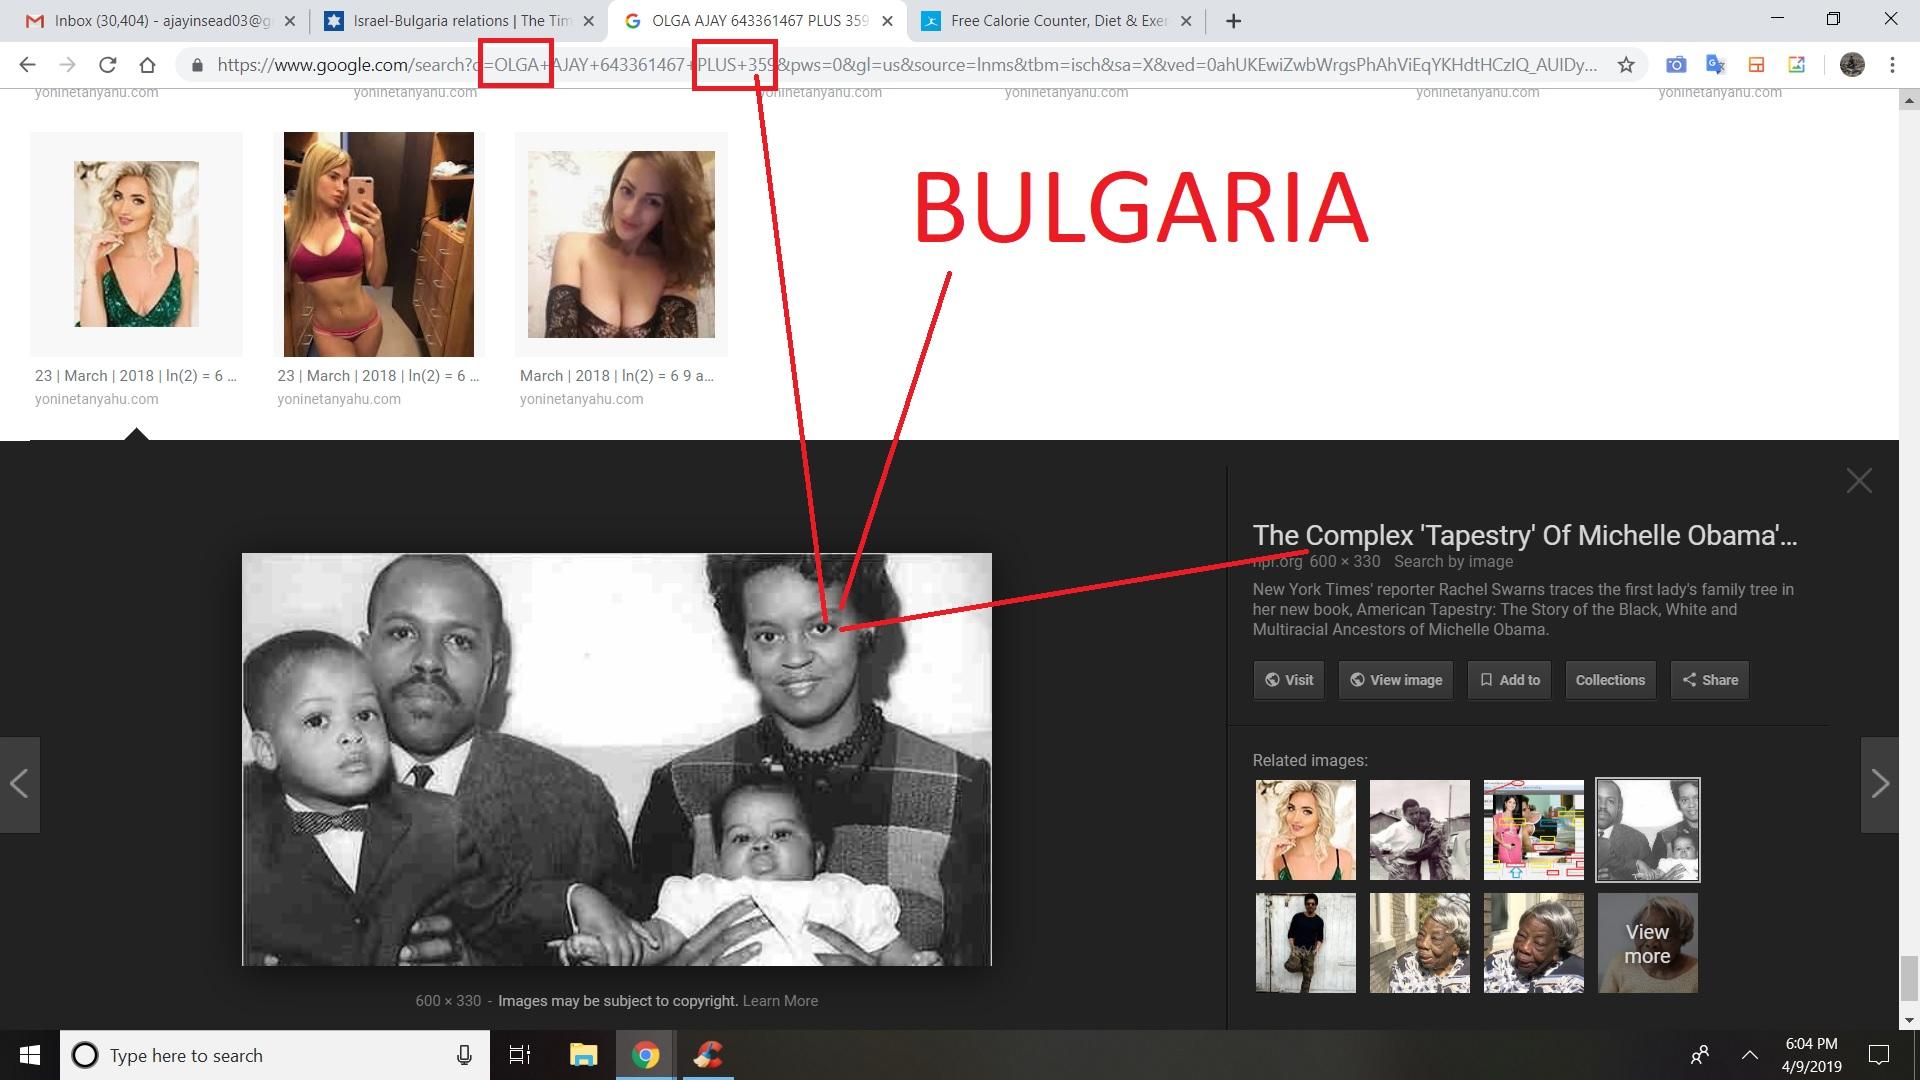 HERE IS BULGARIA